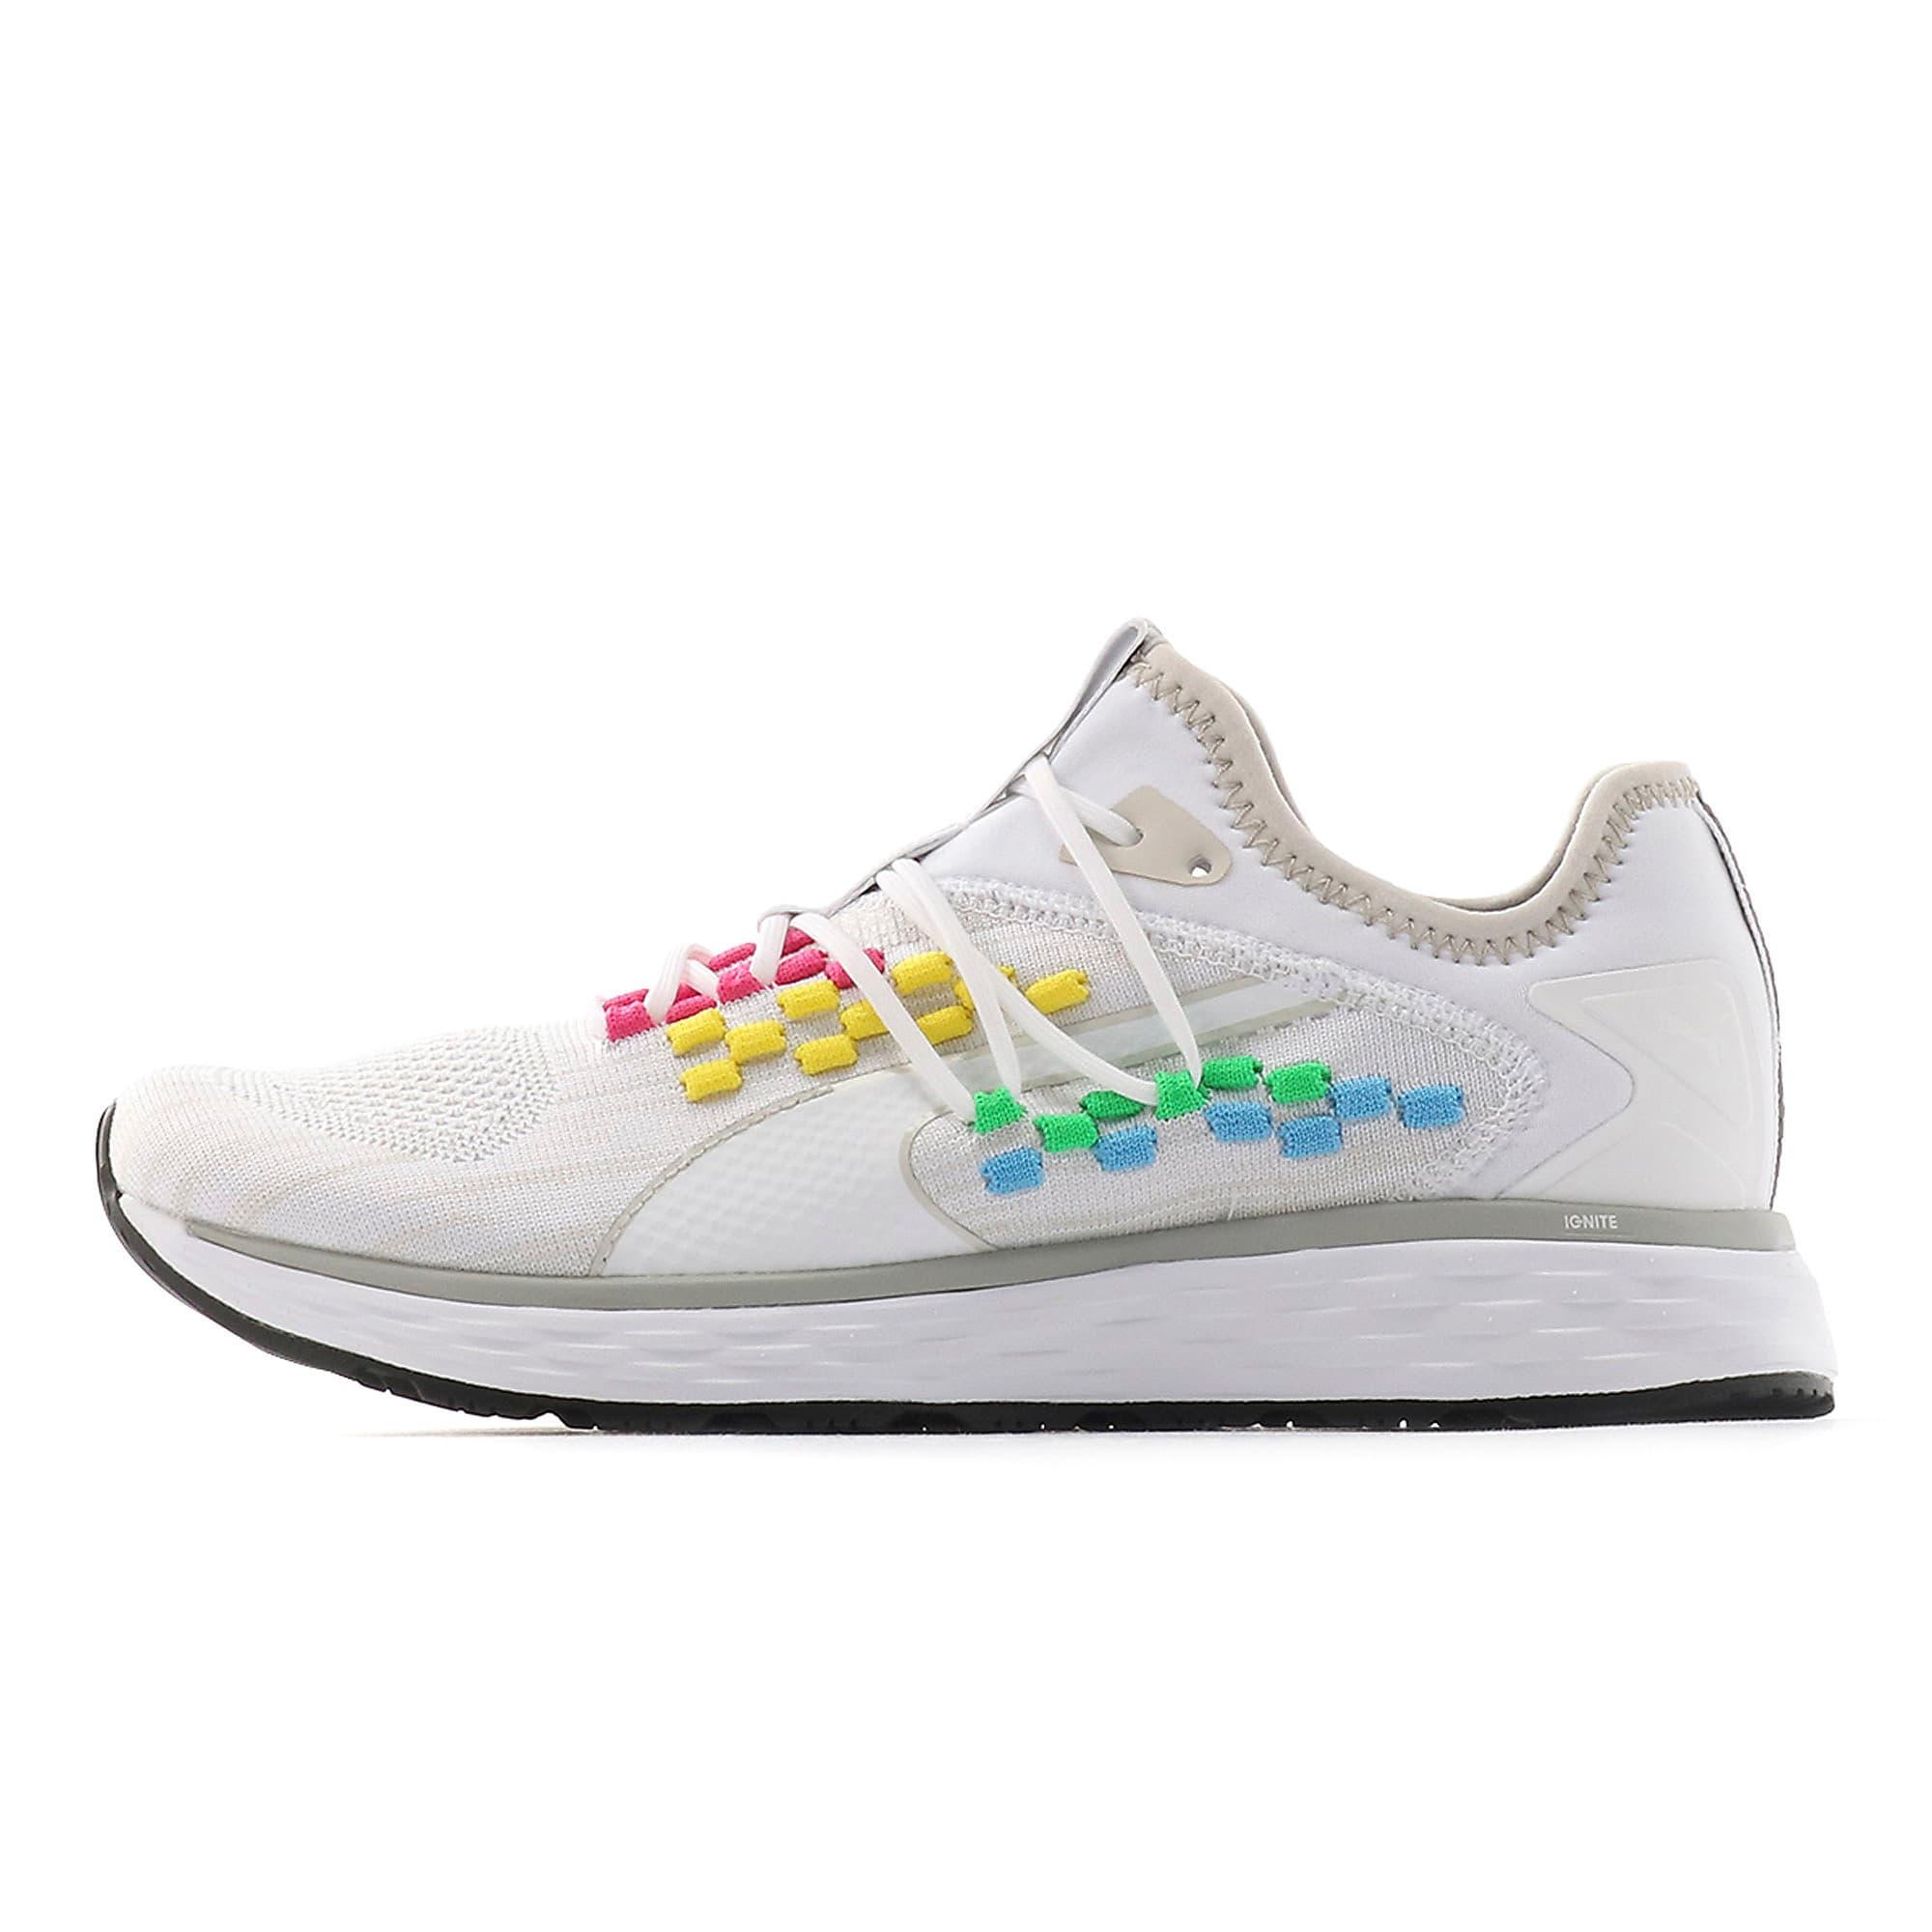 Thumbnail 1 of Speed 600 FUSEFIT Women's Running Sneakers, Puma White, medium-IND